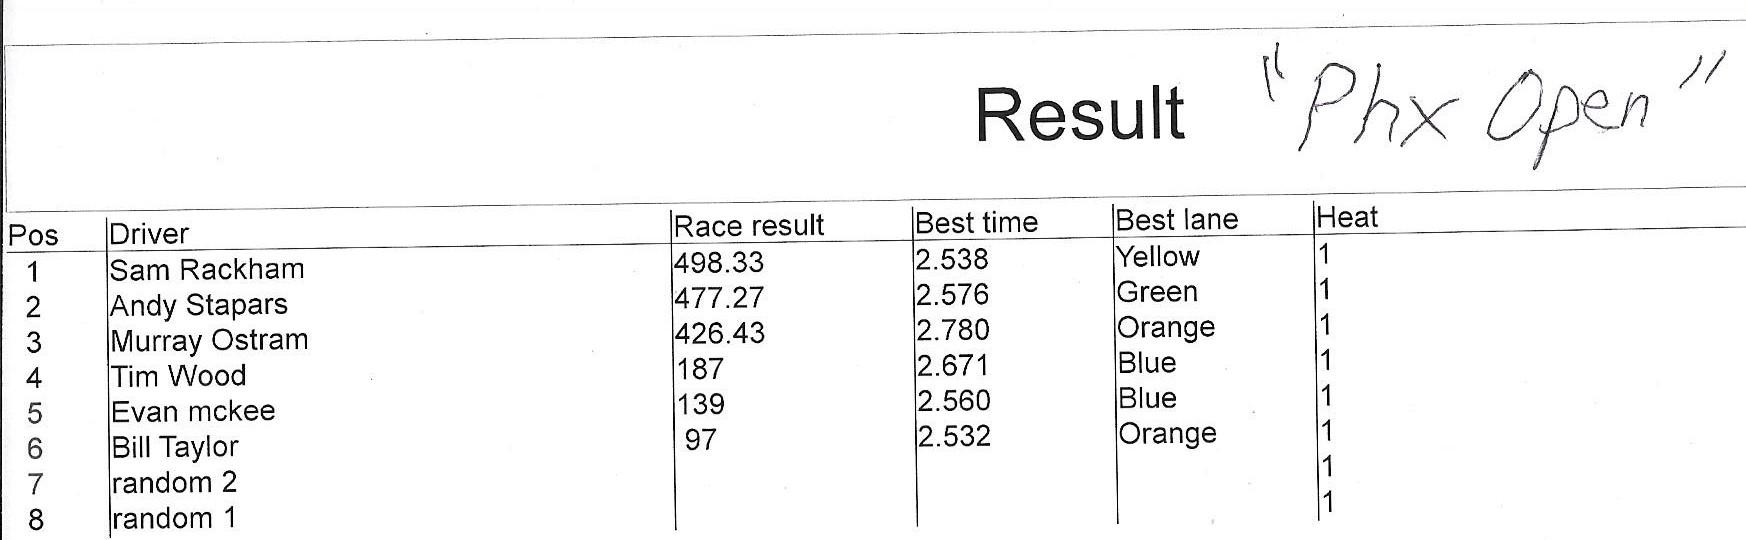 6119 phx open results.jpeg